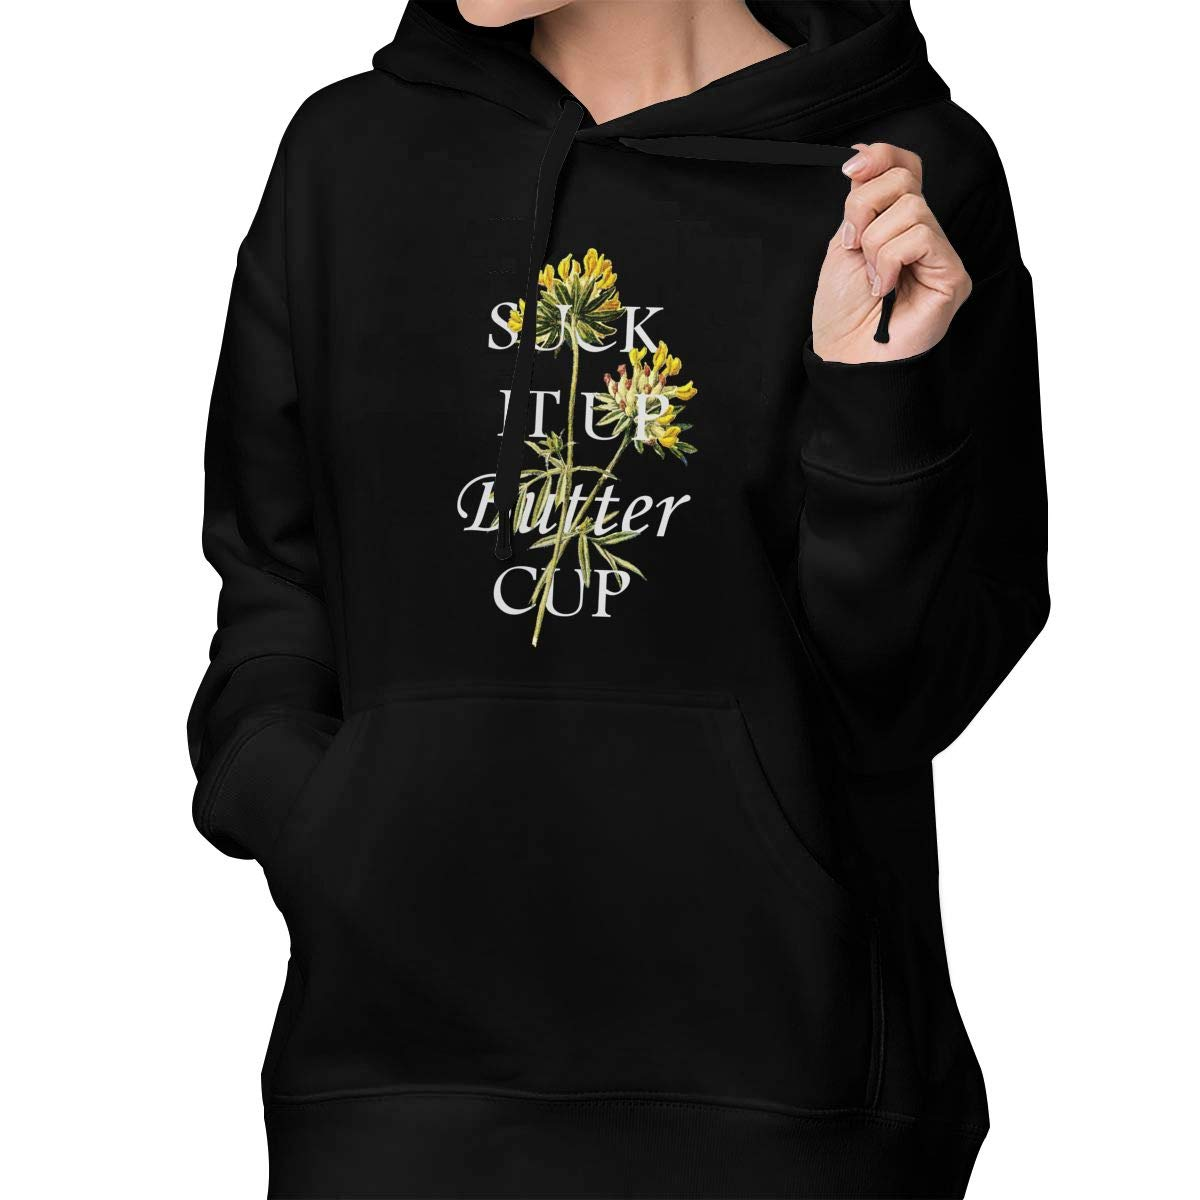 Lponvx Suck It Up Buttercup Inspiring Words Women Girl Fashion Sweatshirts Jackets Coats with Drawstring Hood